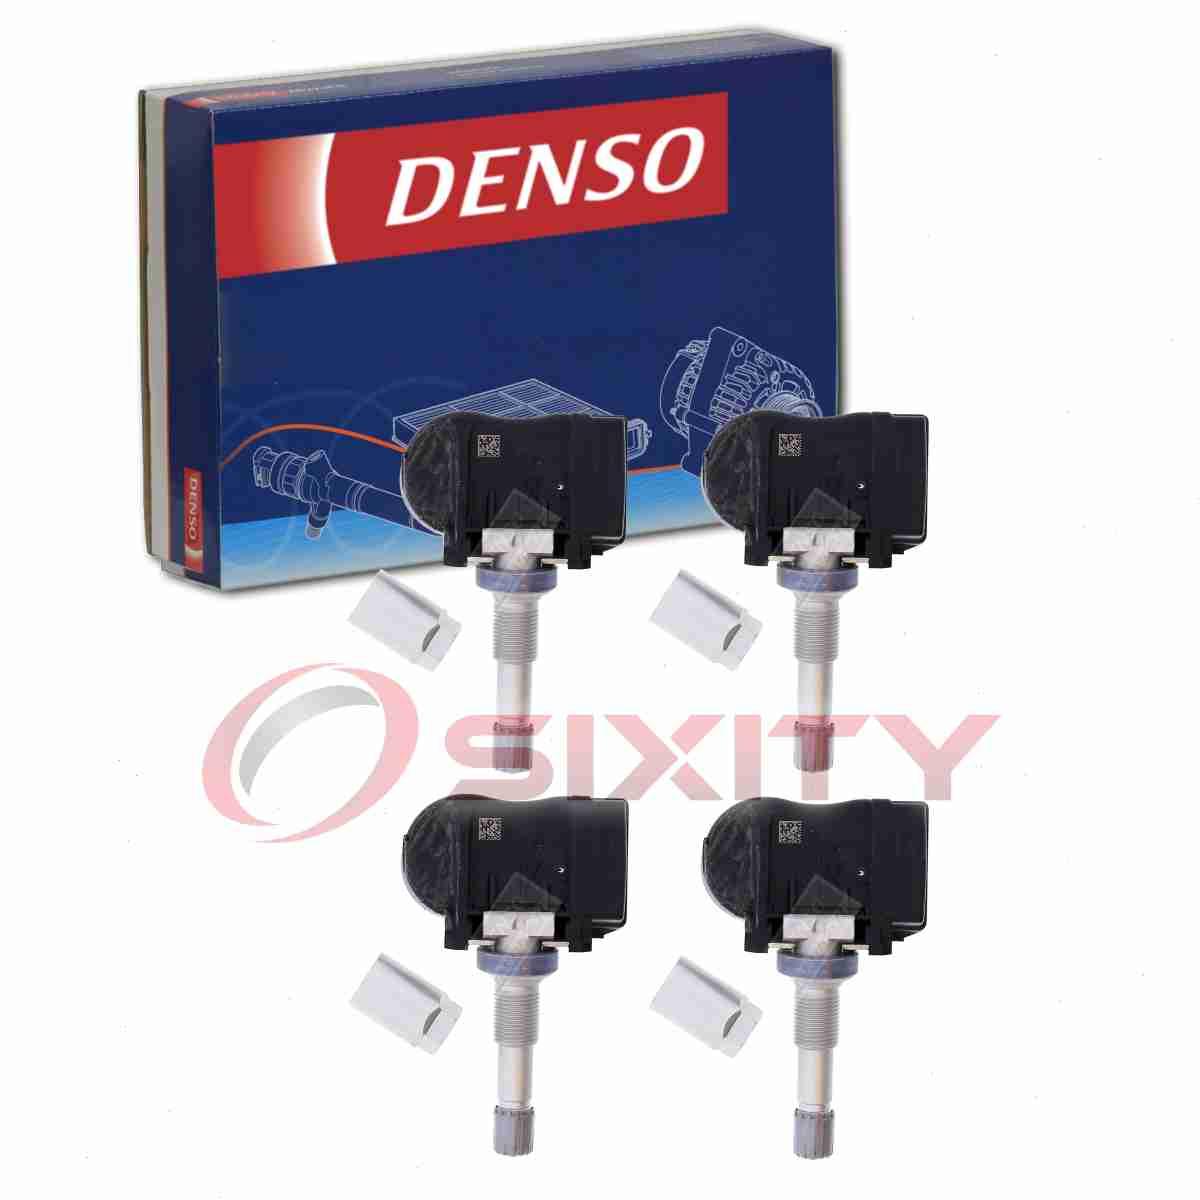 Hyundai Elantra: Tires pressure monitoring system (TPMS)